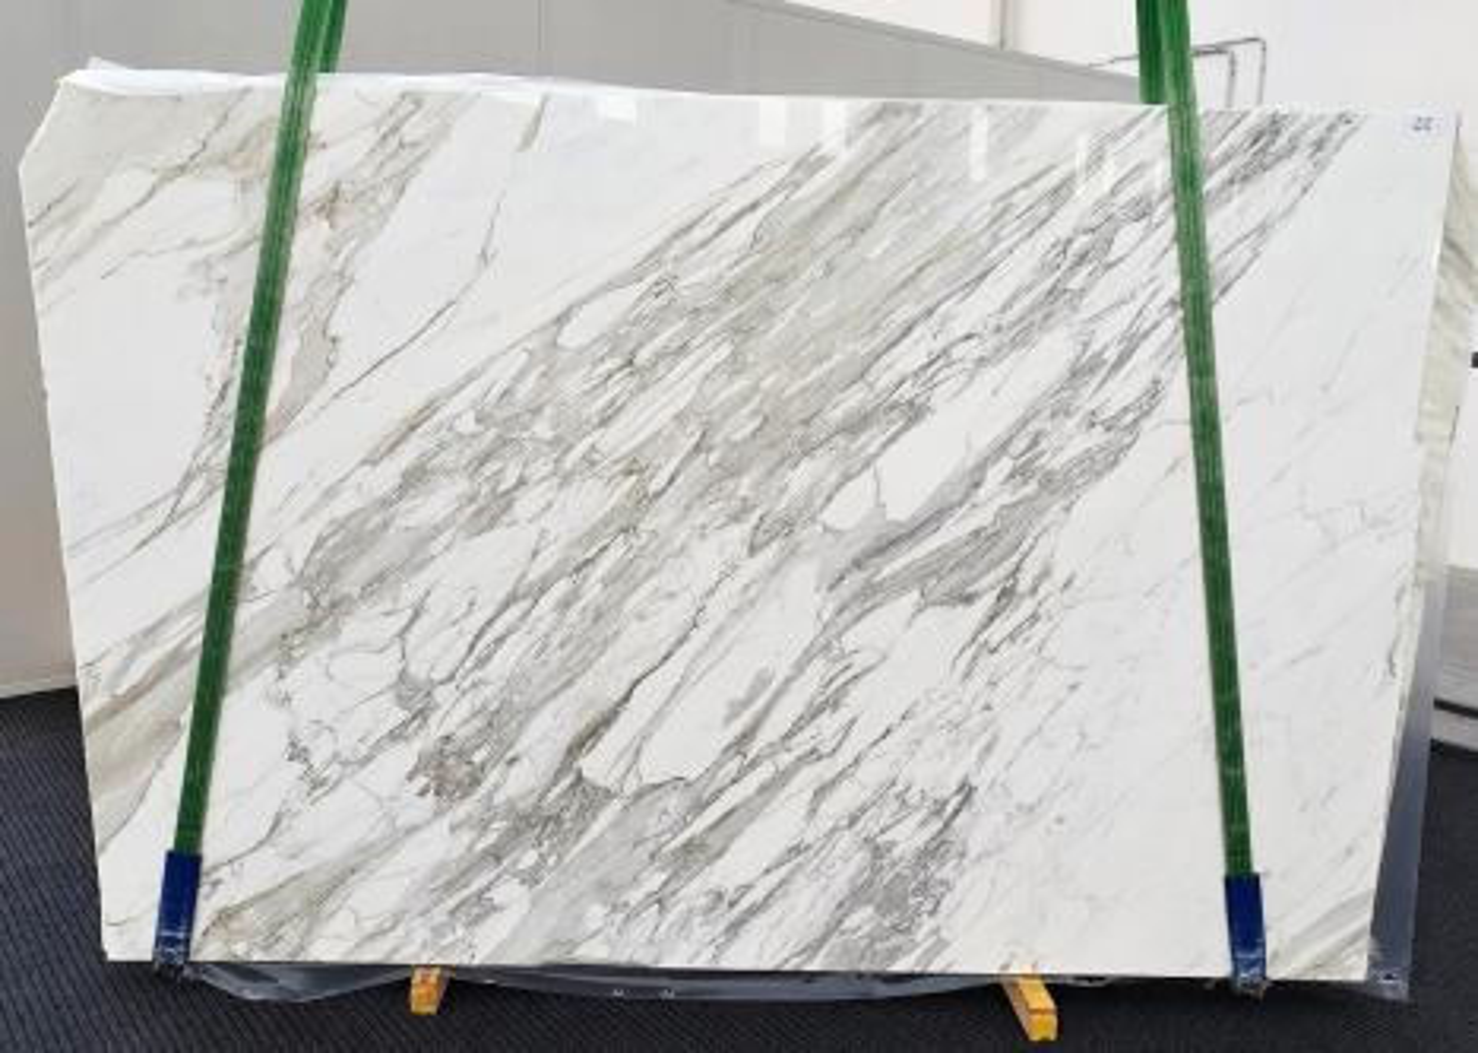 CALACATTA Supply Veneto (Italy) polished slabs 1344 , C - slab #22 natural marble